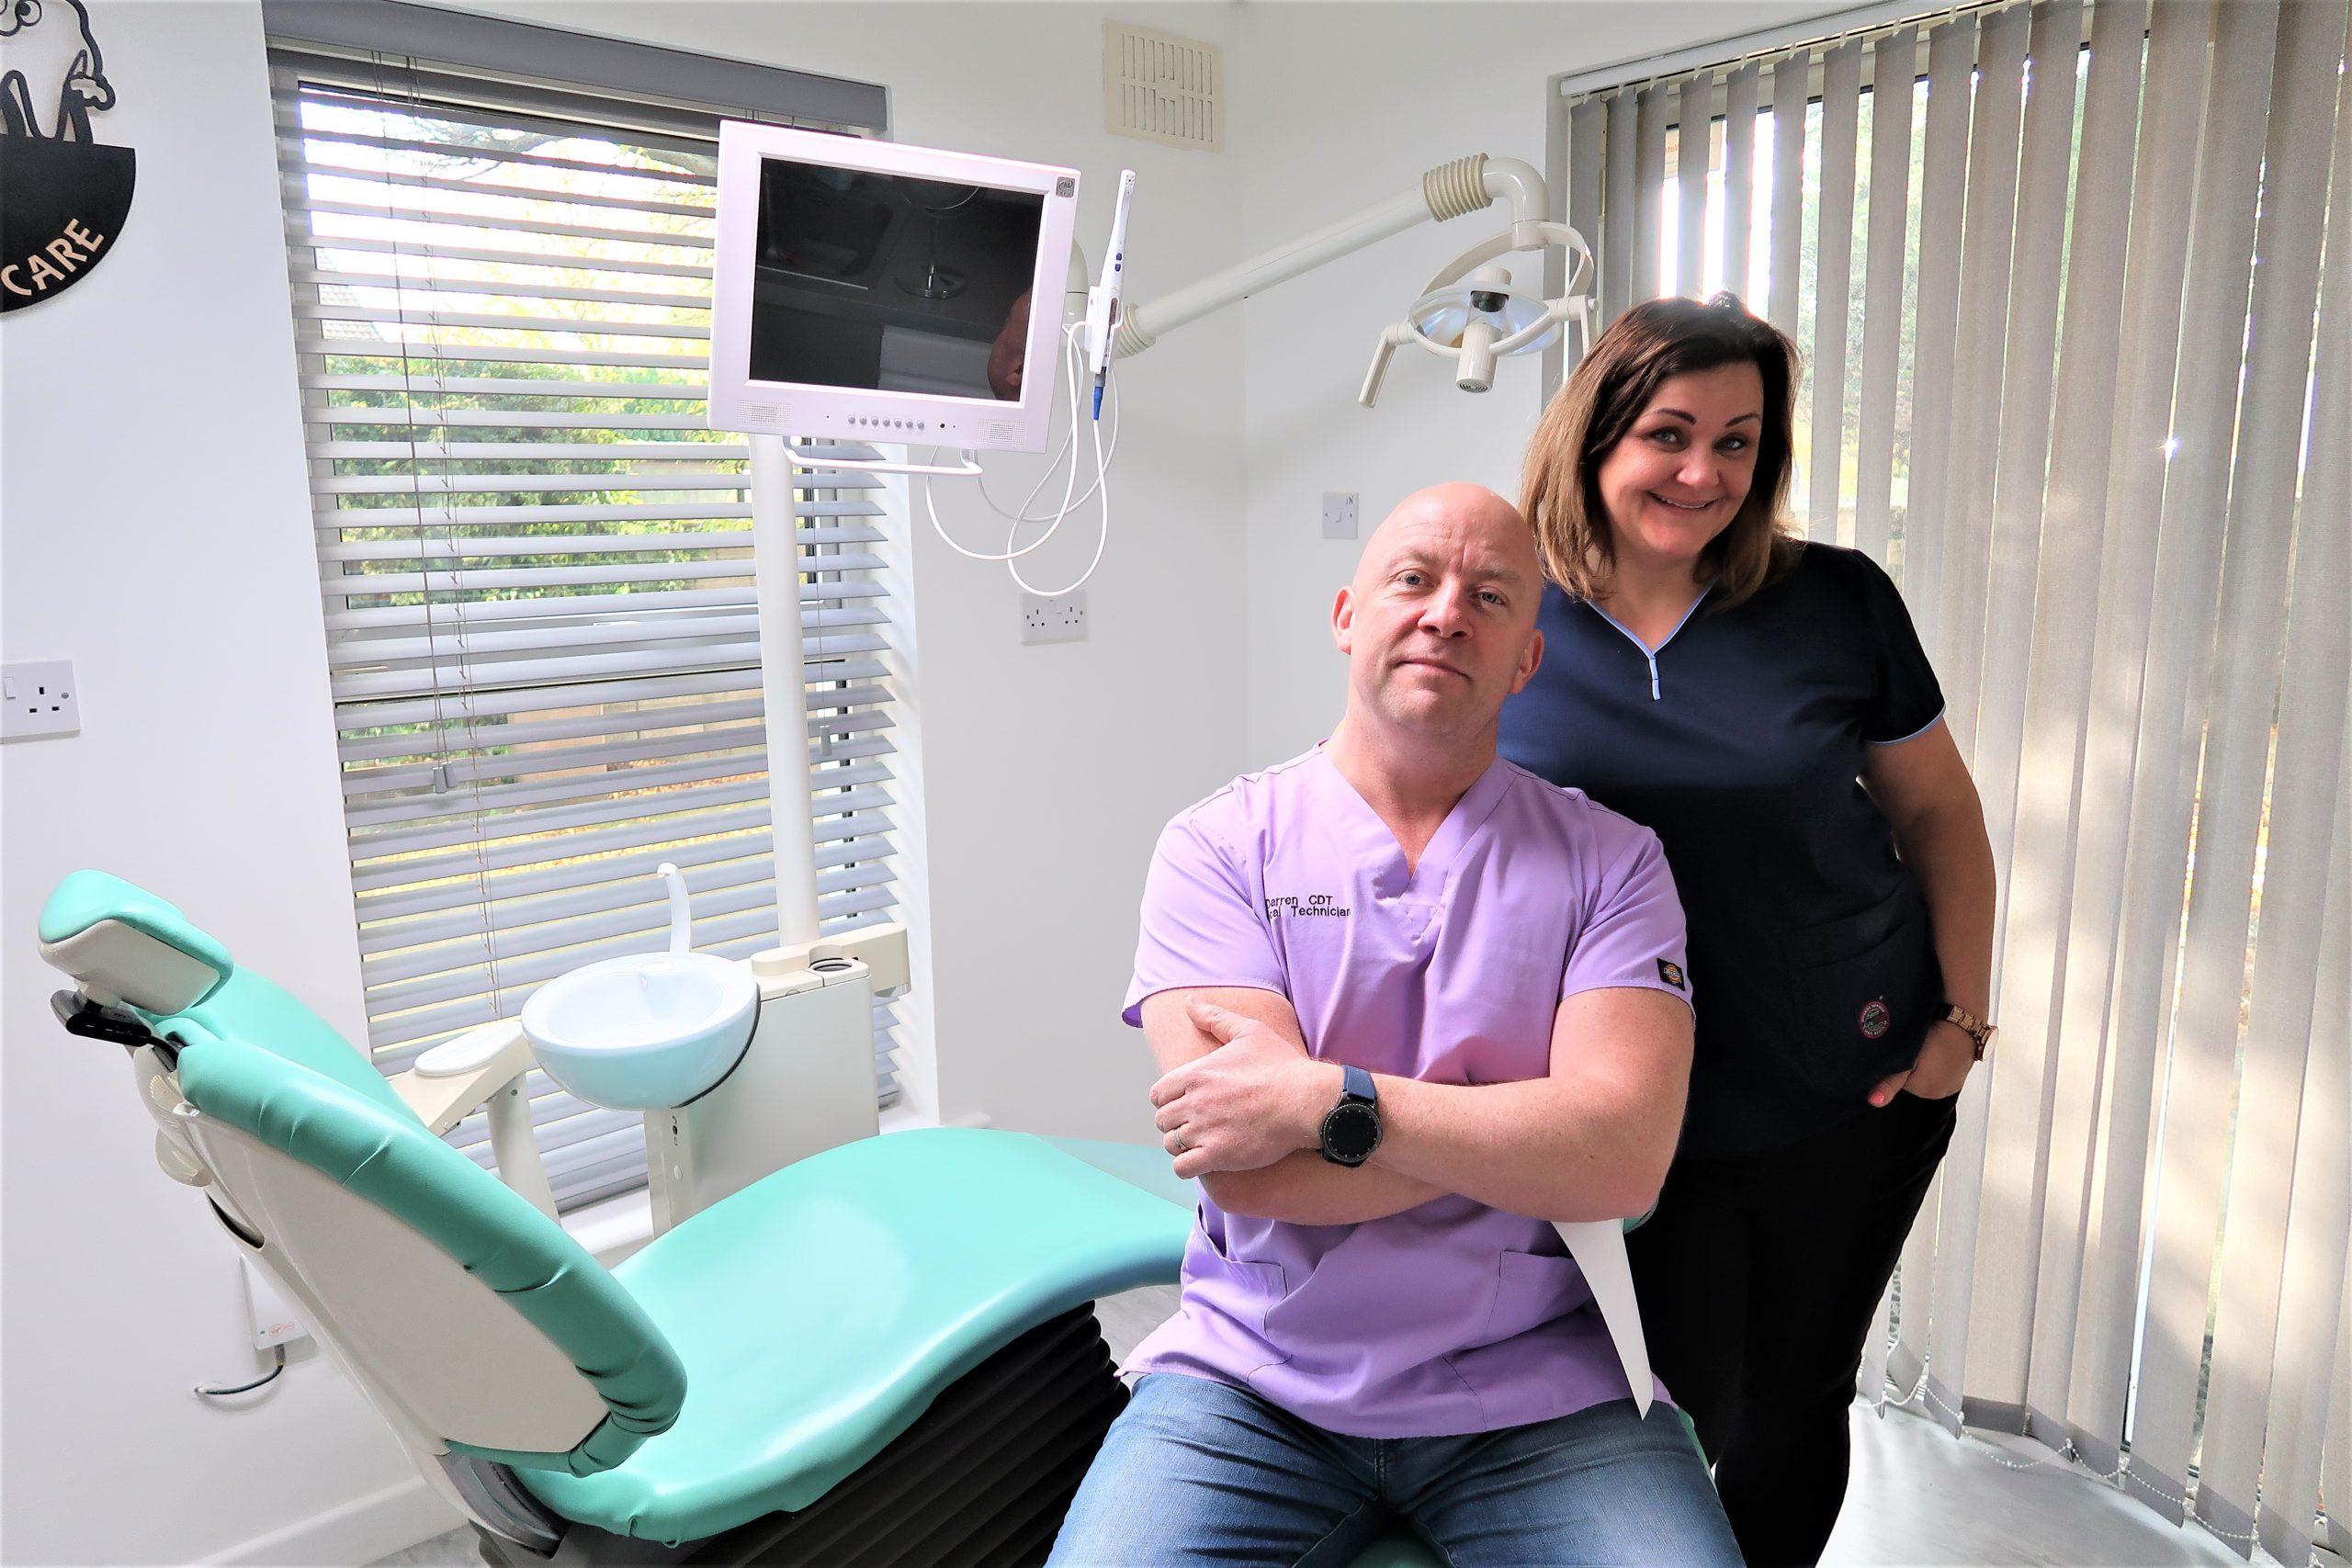 Darren and the Denture Care team